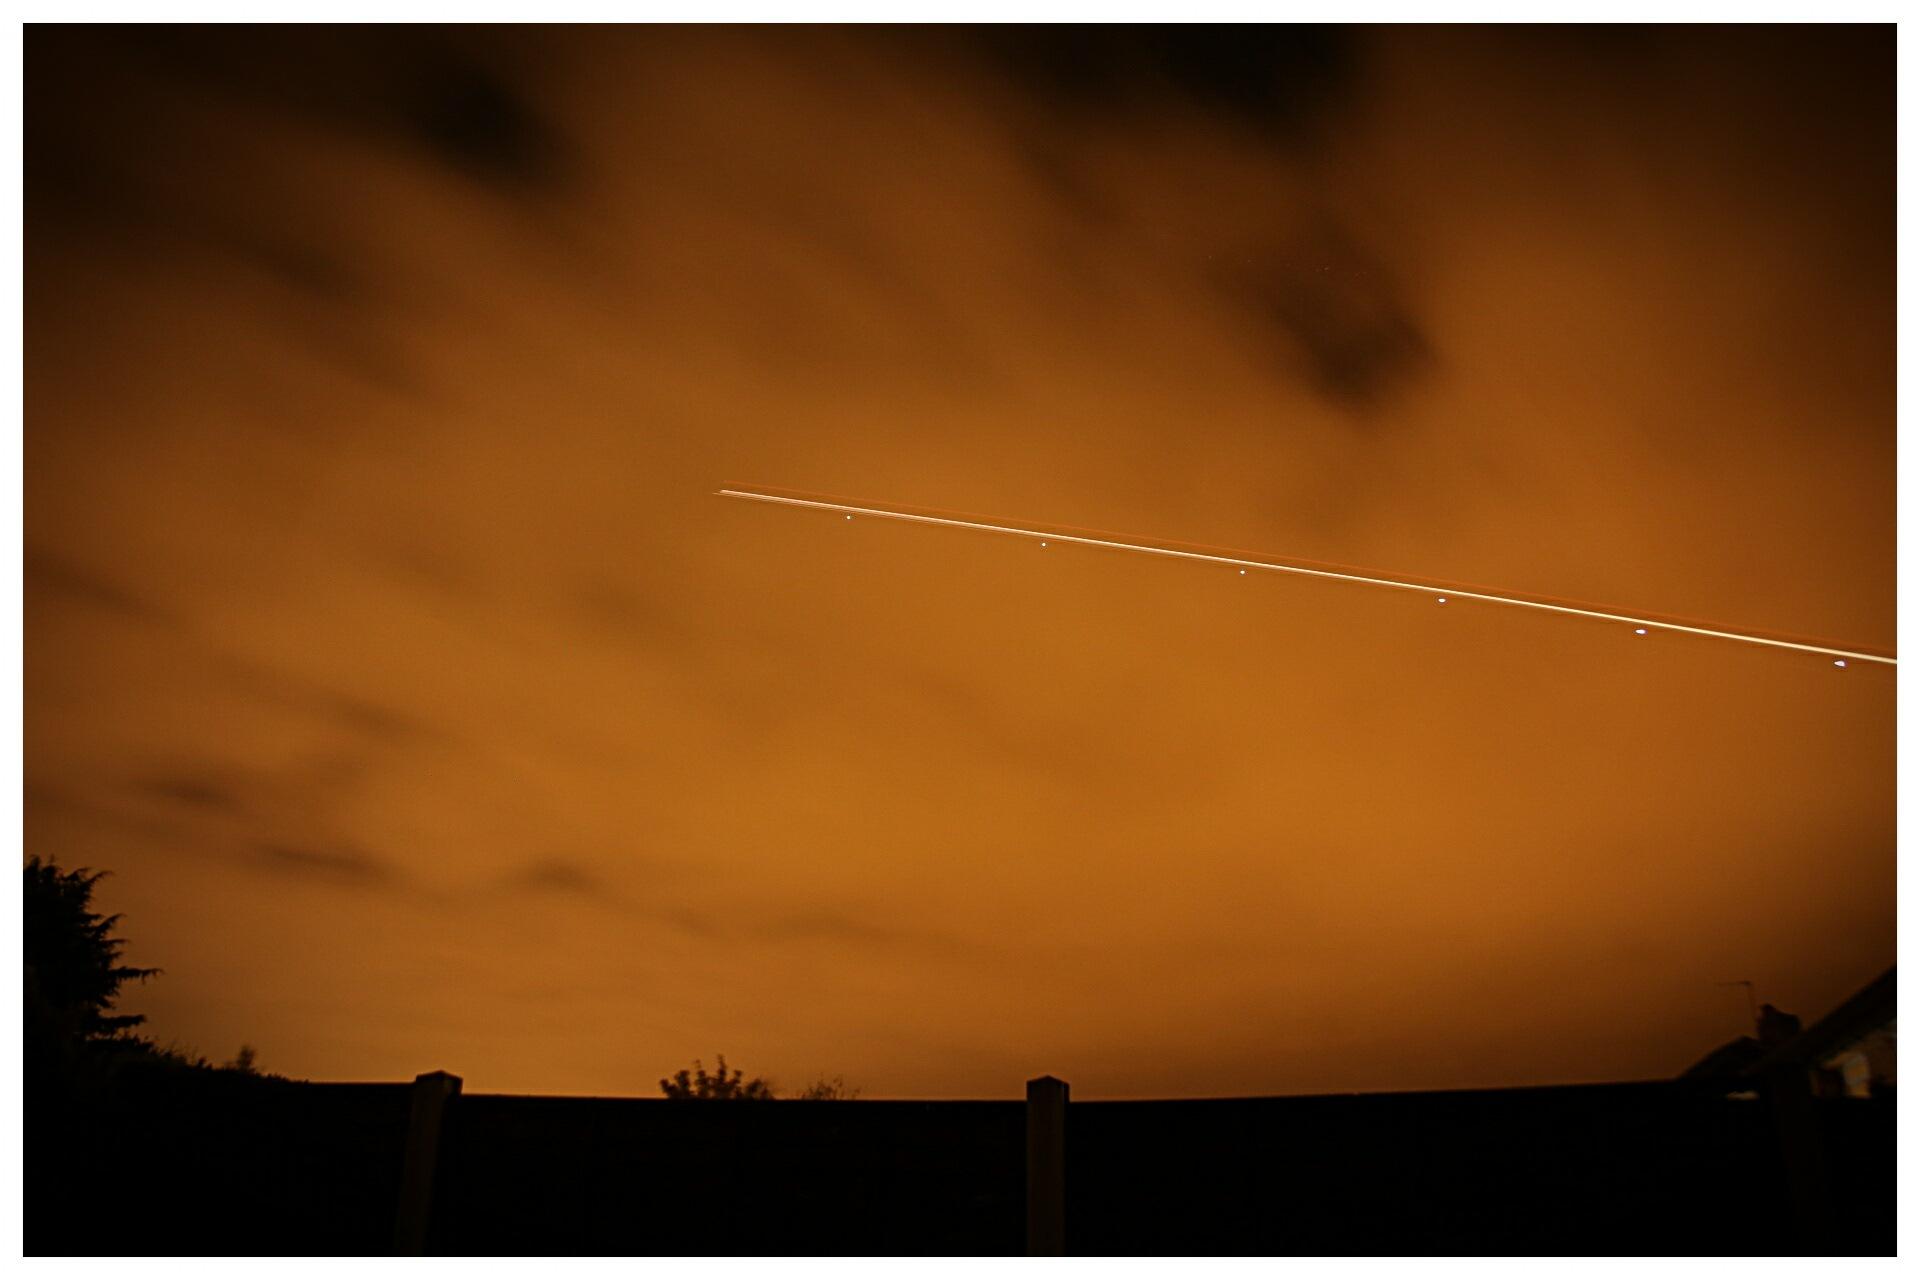 Night Flight 2 by Yvonne Lewis